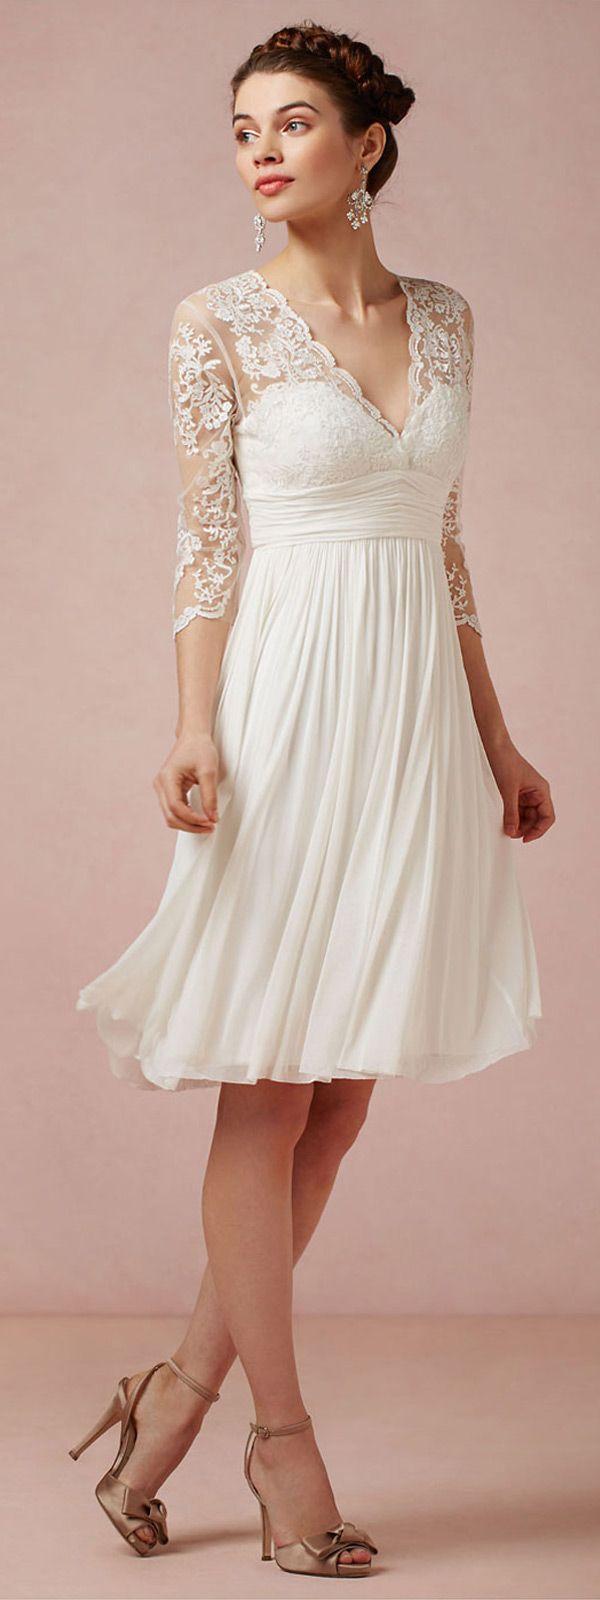 white lace empire waist dress